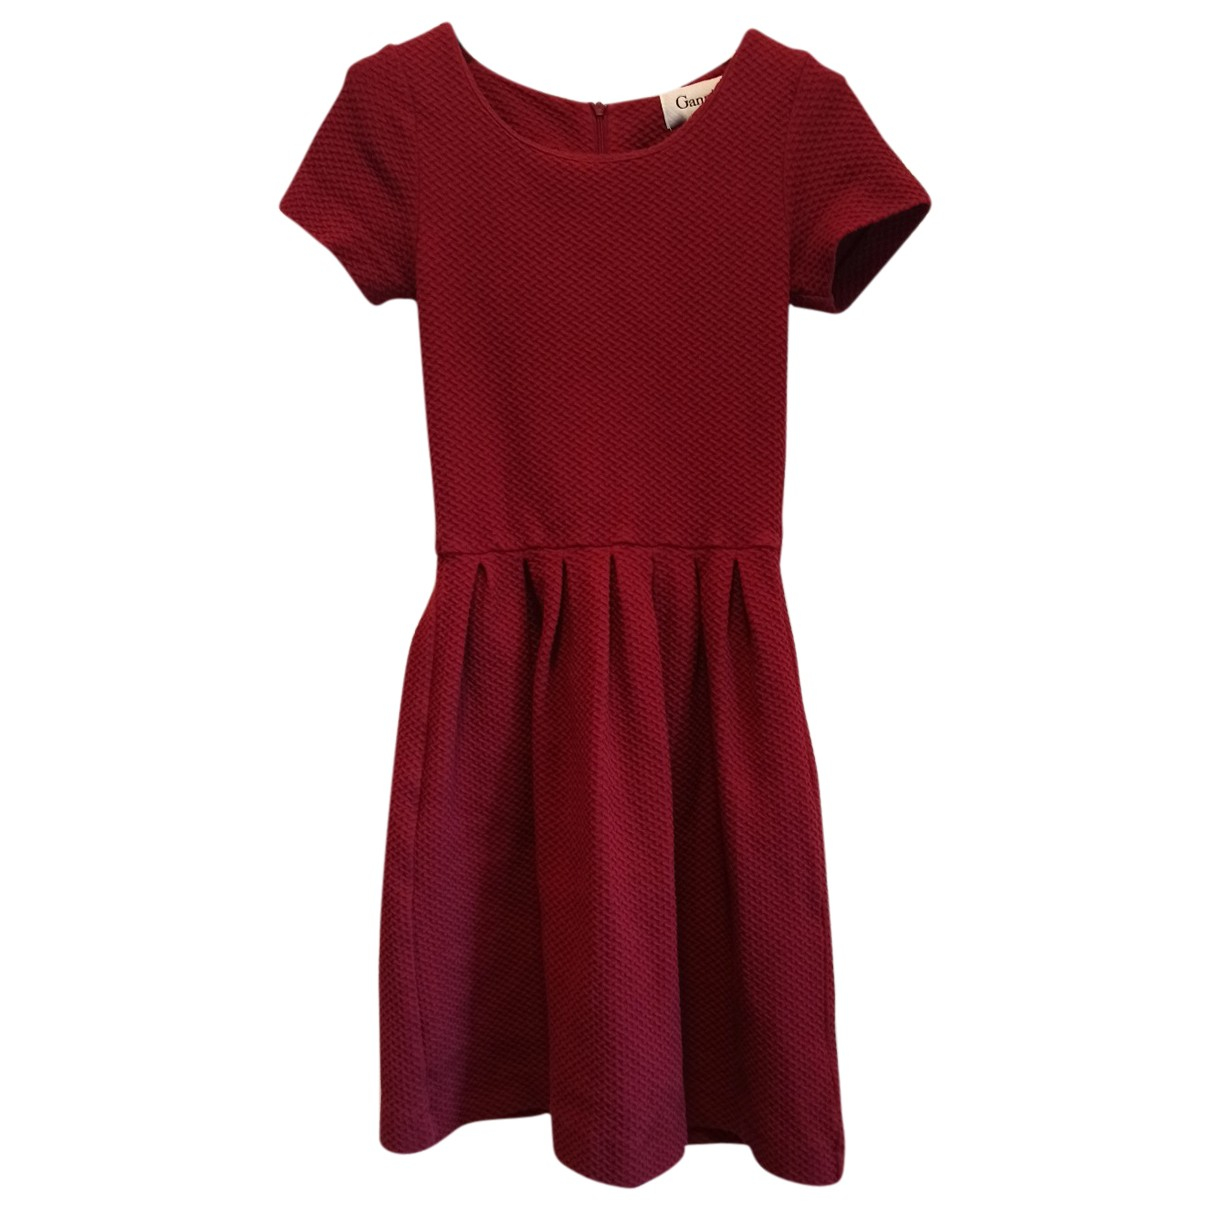 Ganni \N Burgundy Cotton - elasthane dress for Women XS International